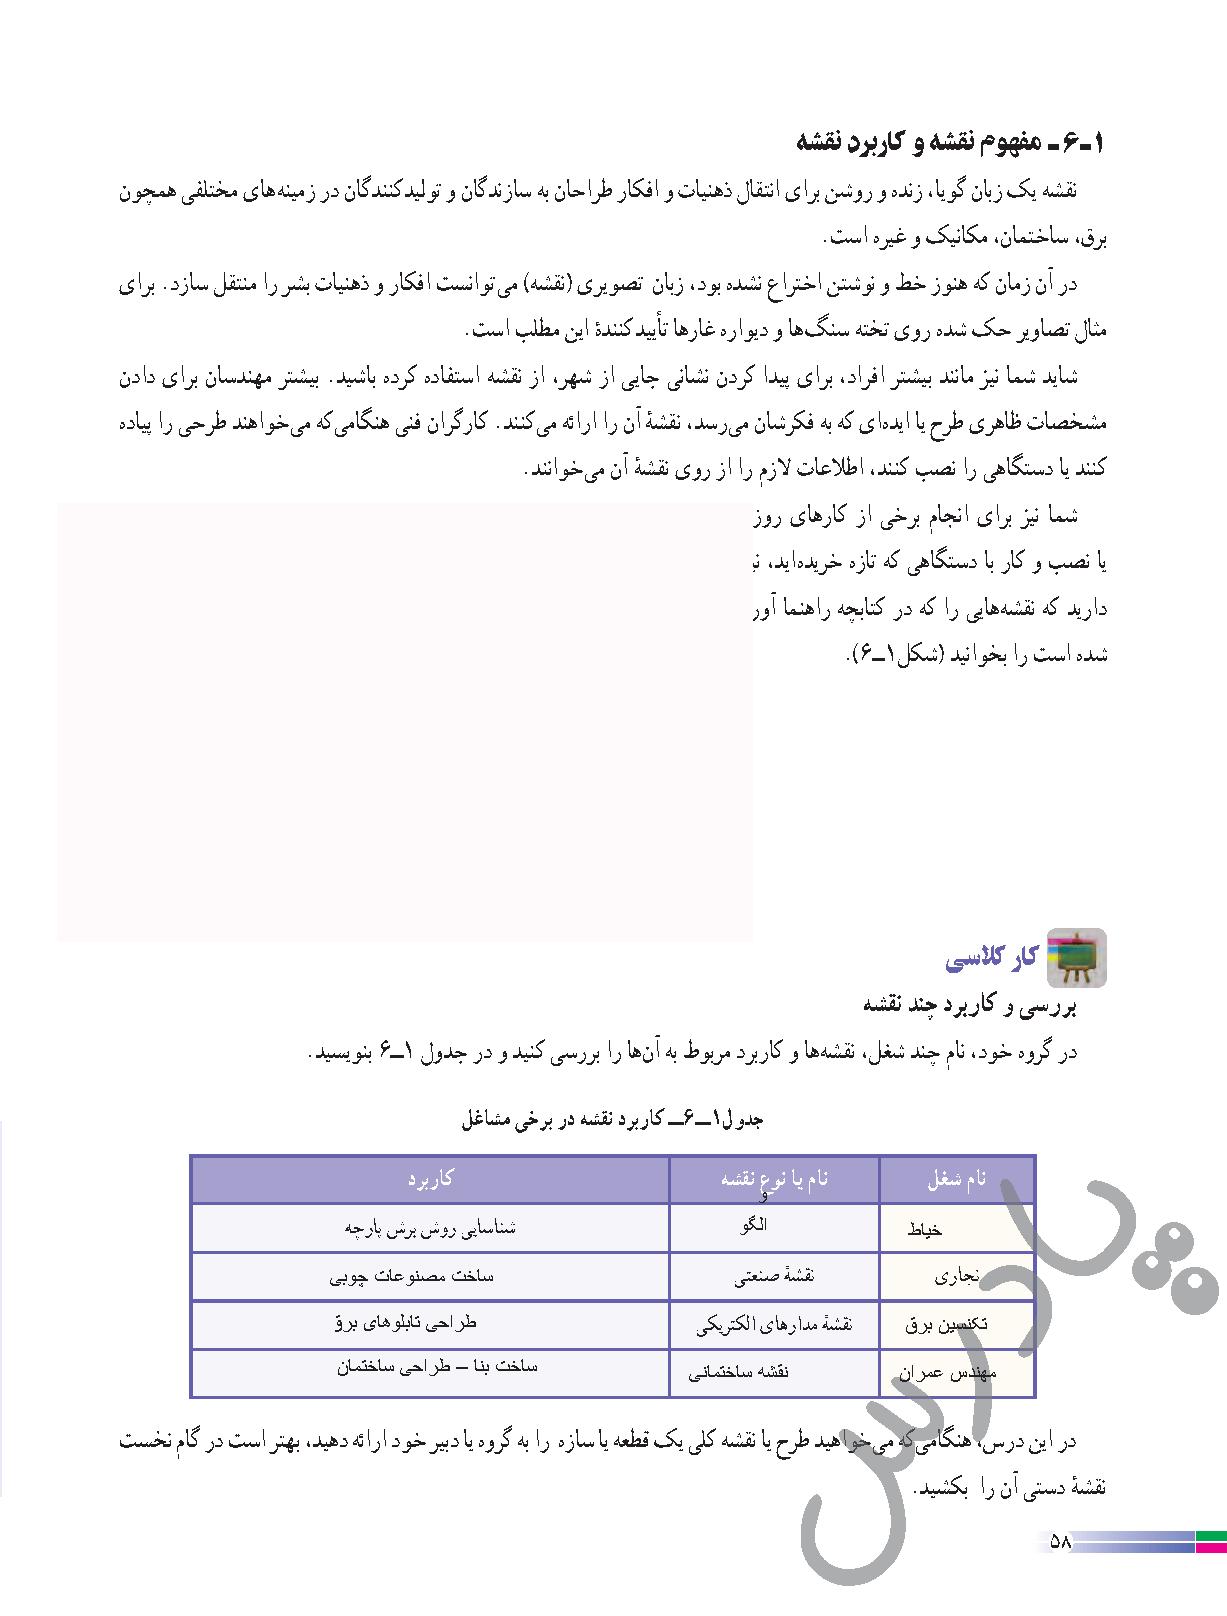 جواب کاردرکلاس صفحه 58 کاروفناوری هفتم